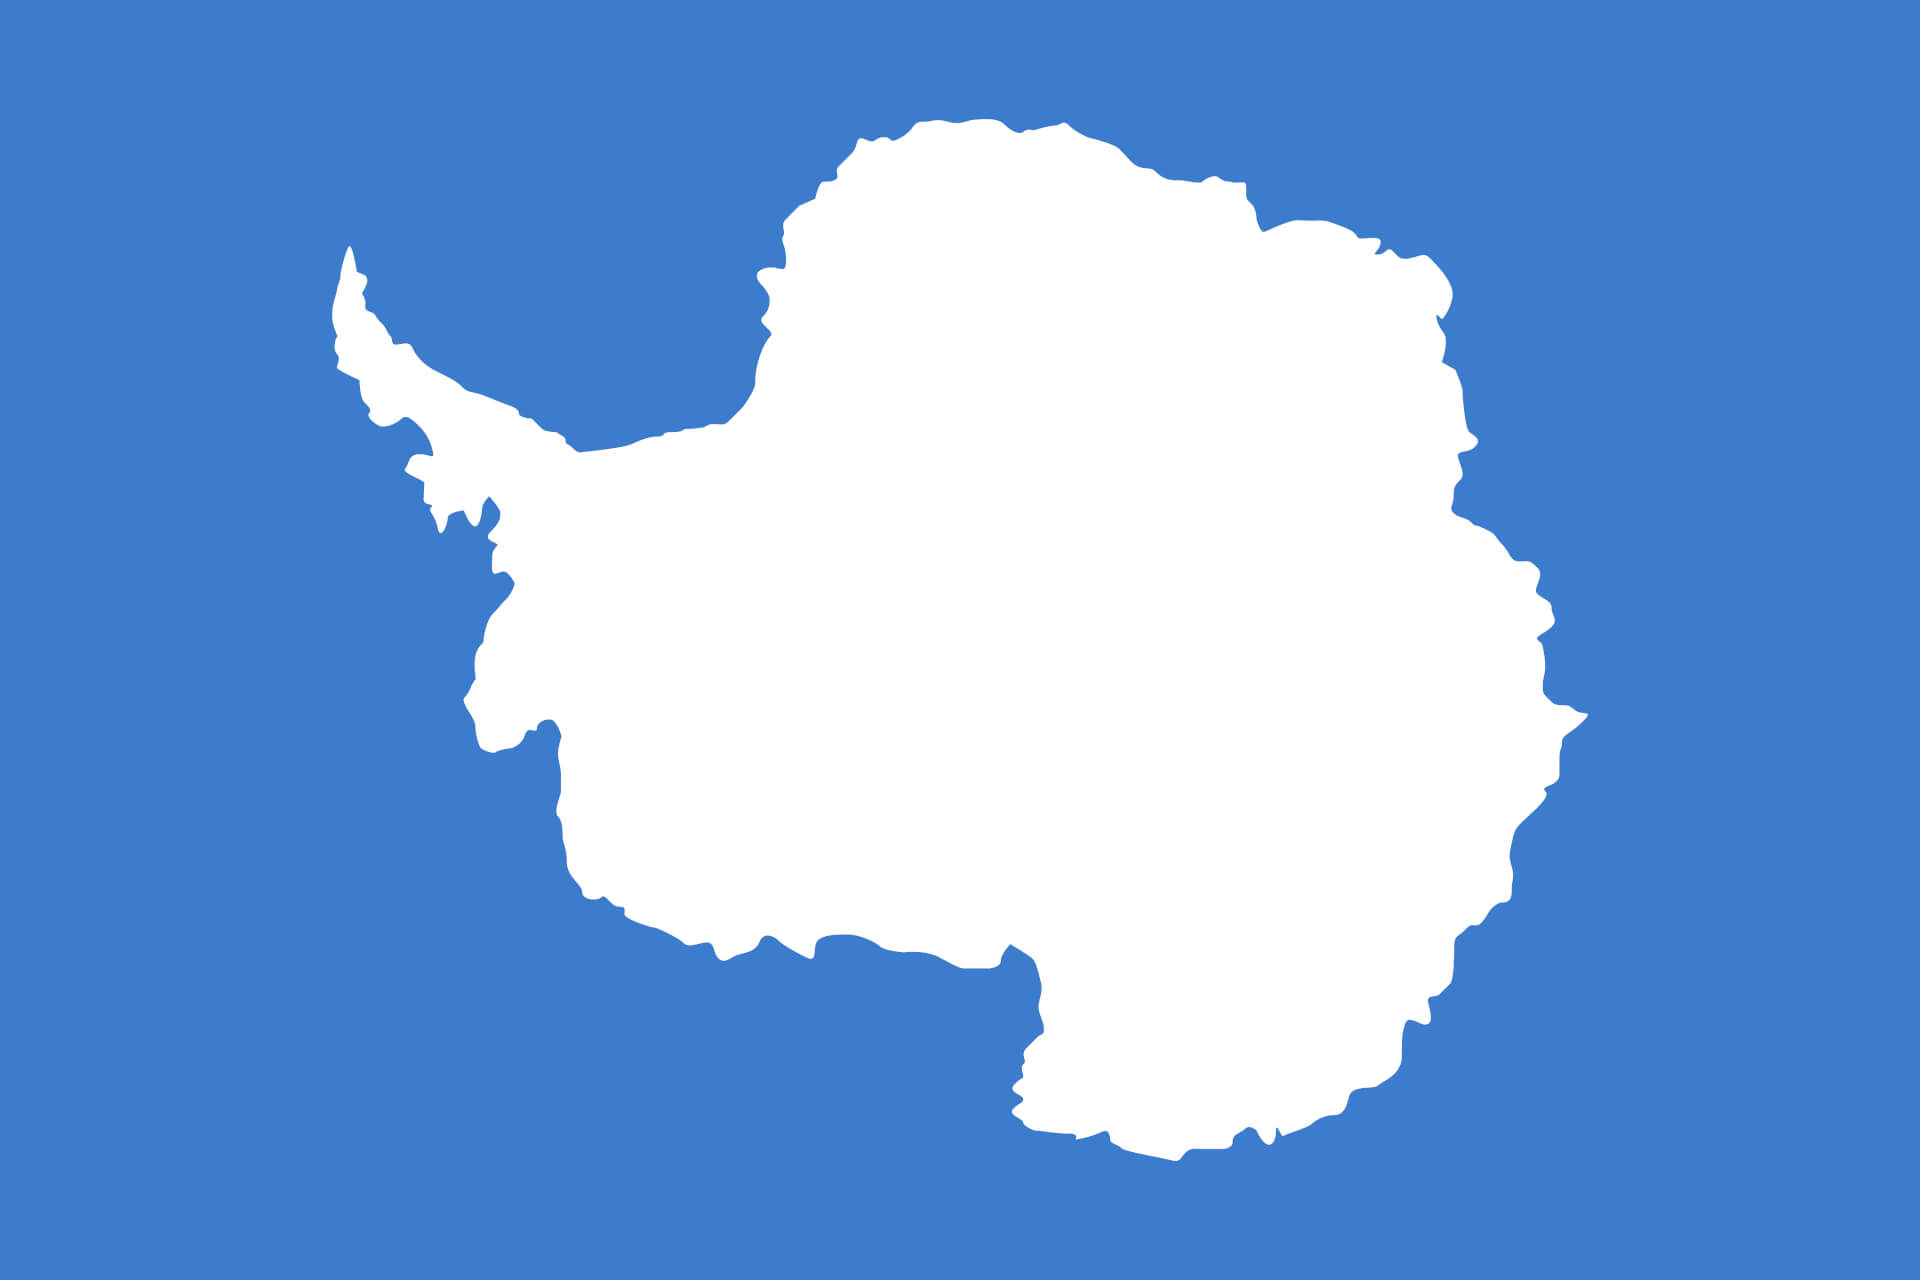 viaggio in Antartide bandiera